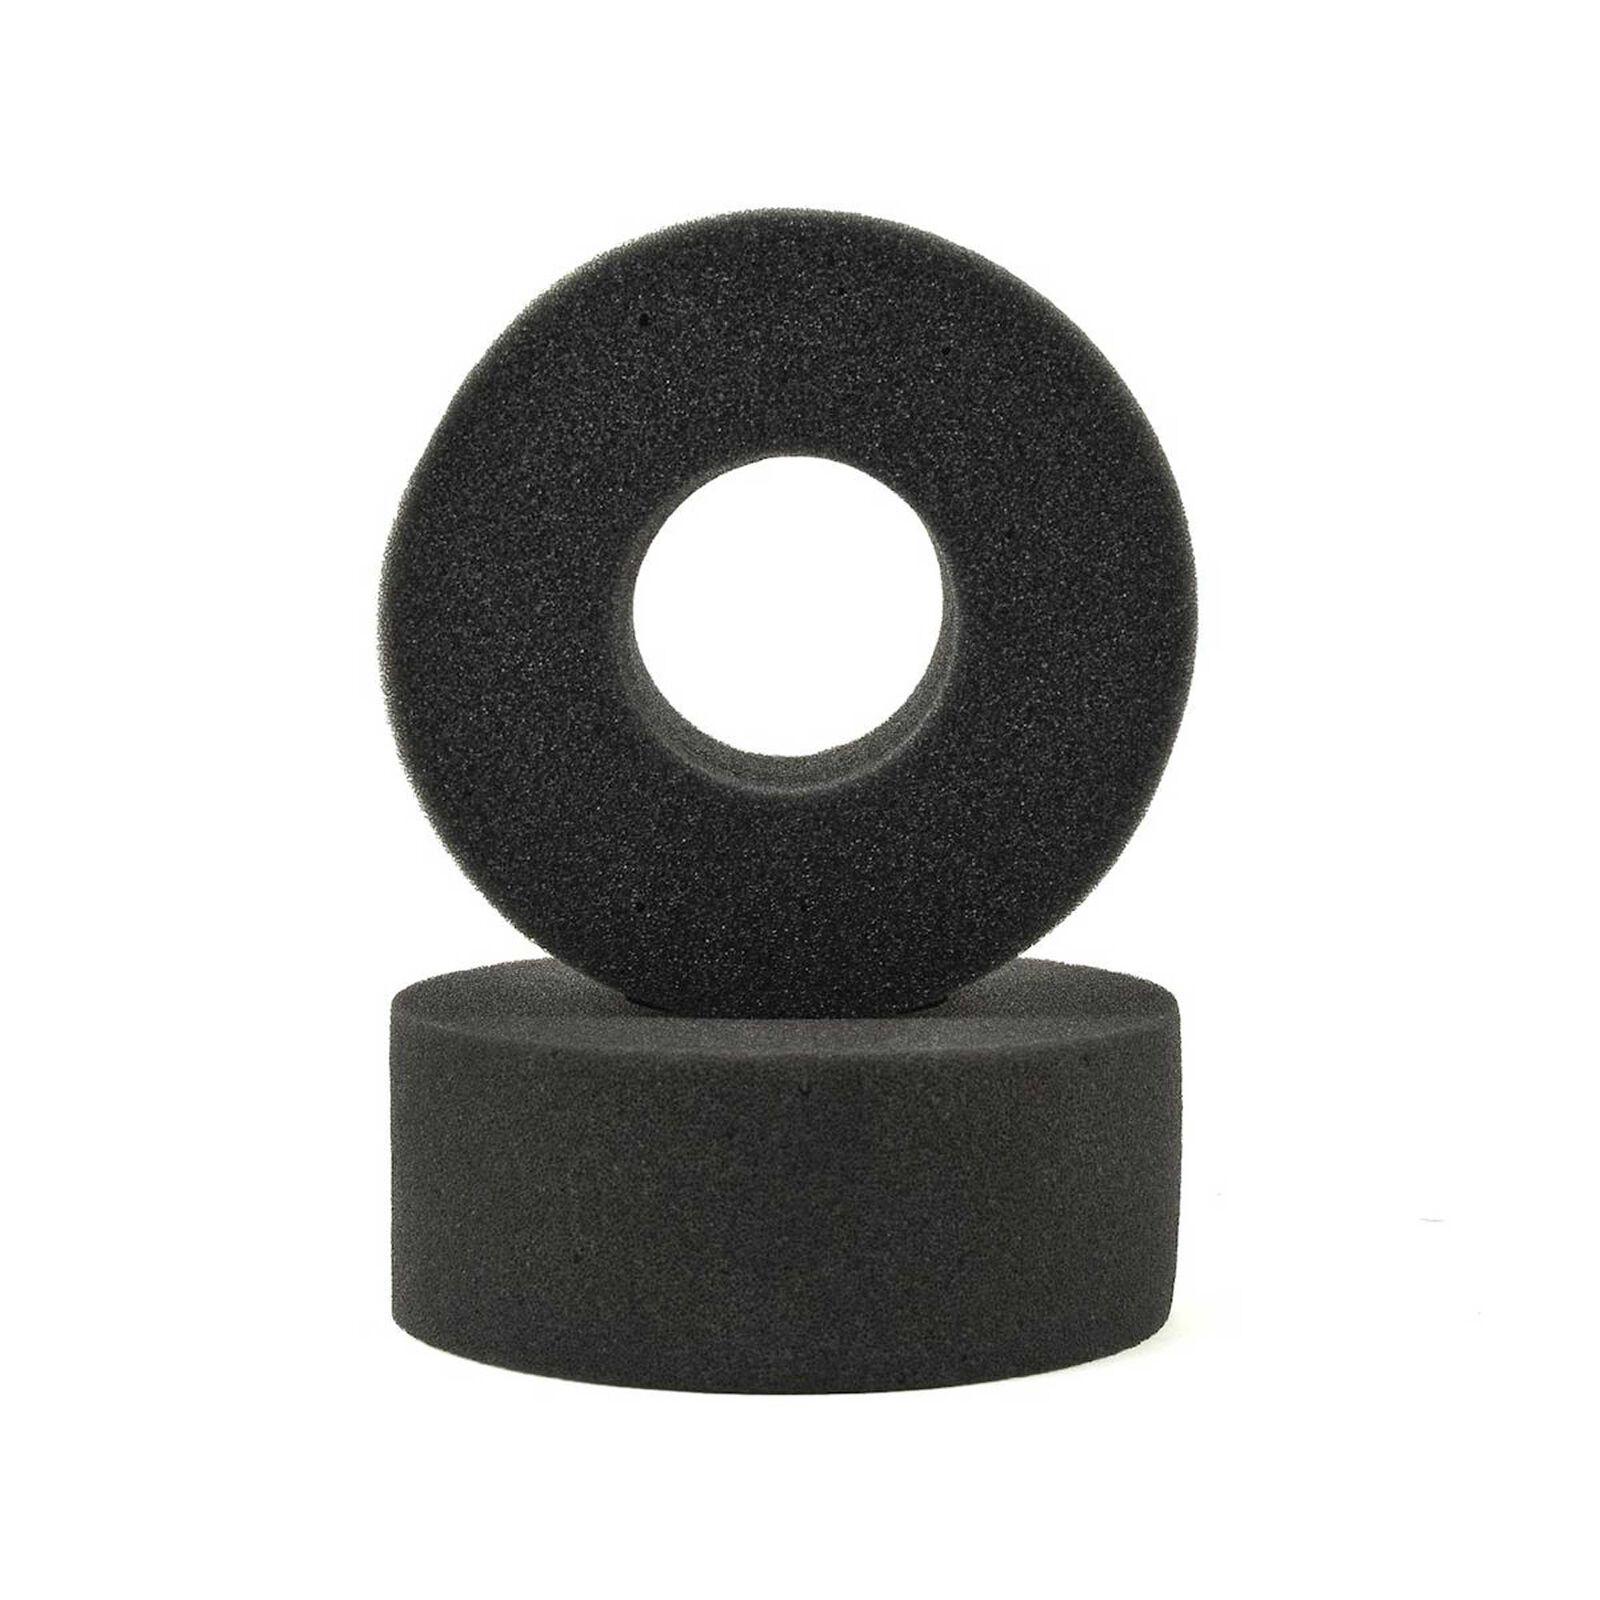 Dirty Richard Single Stage Foam Inserts Soft 115x47.6x48 (2)